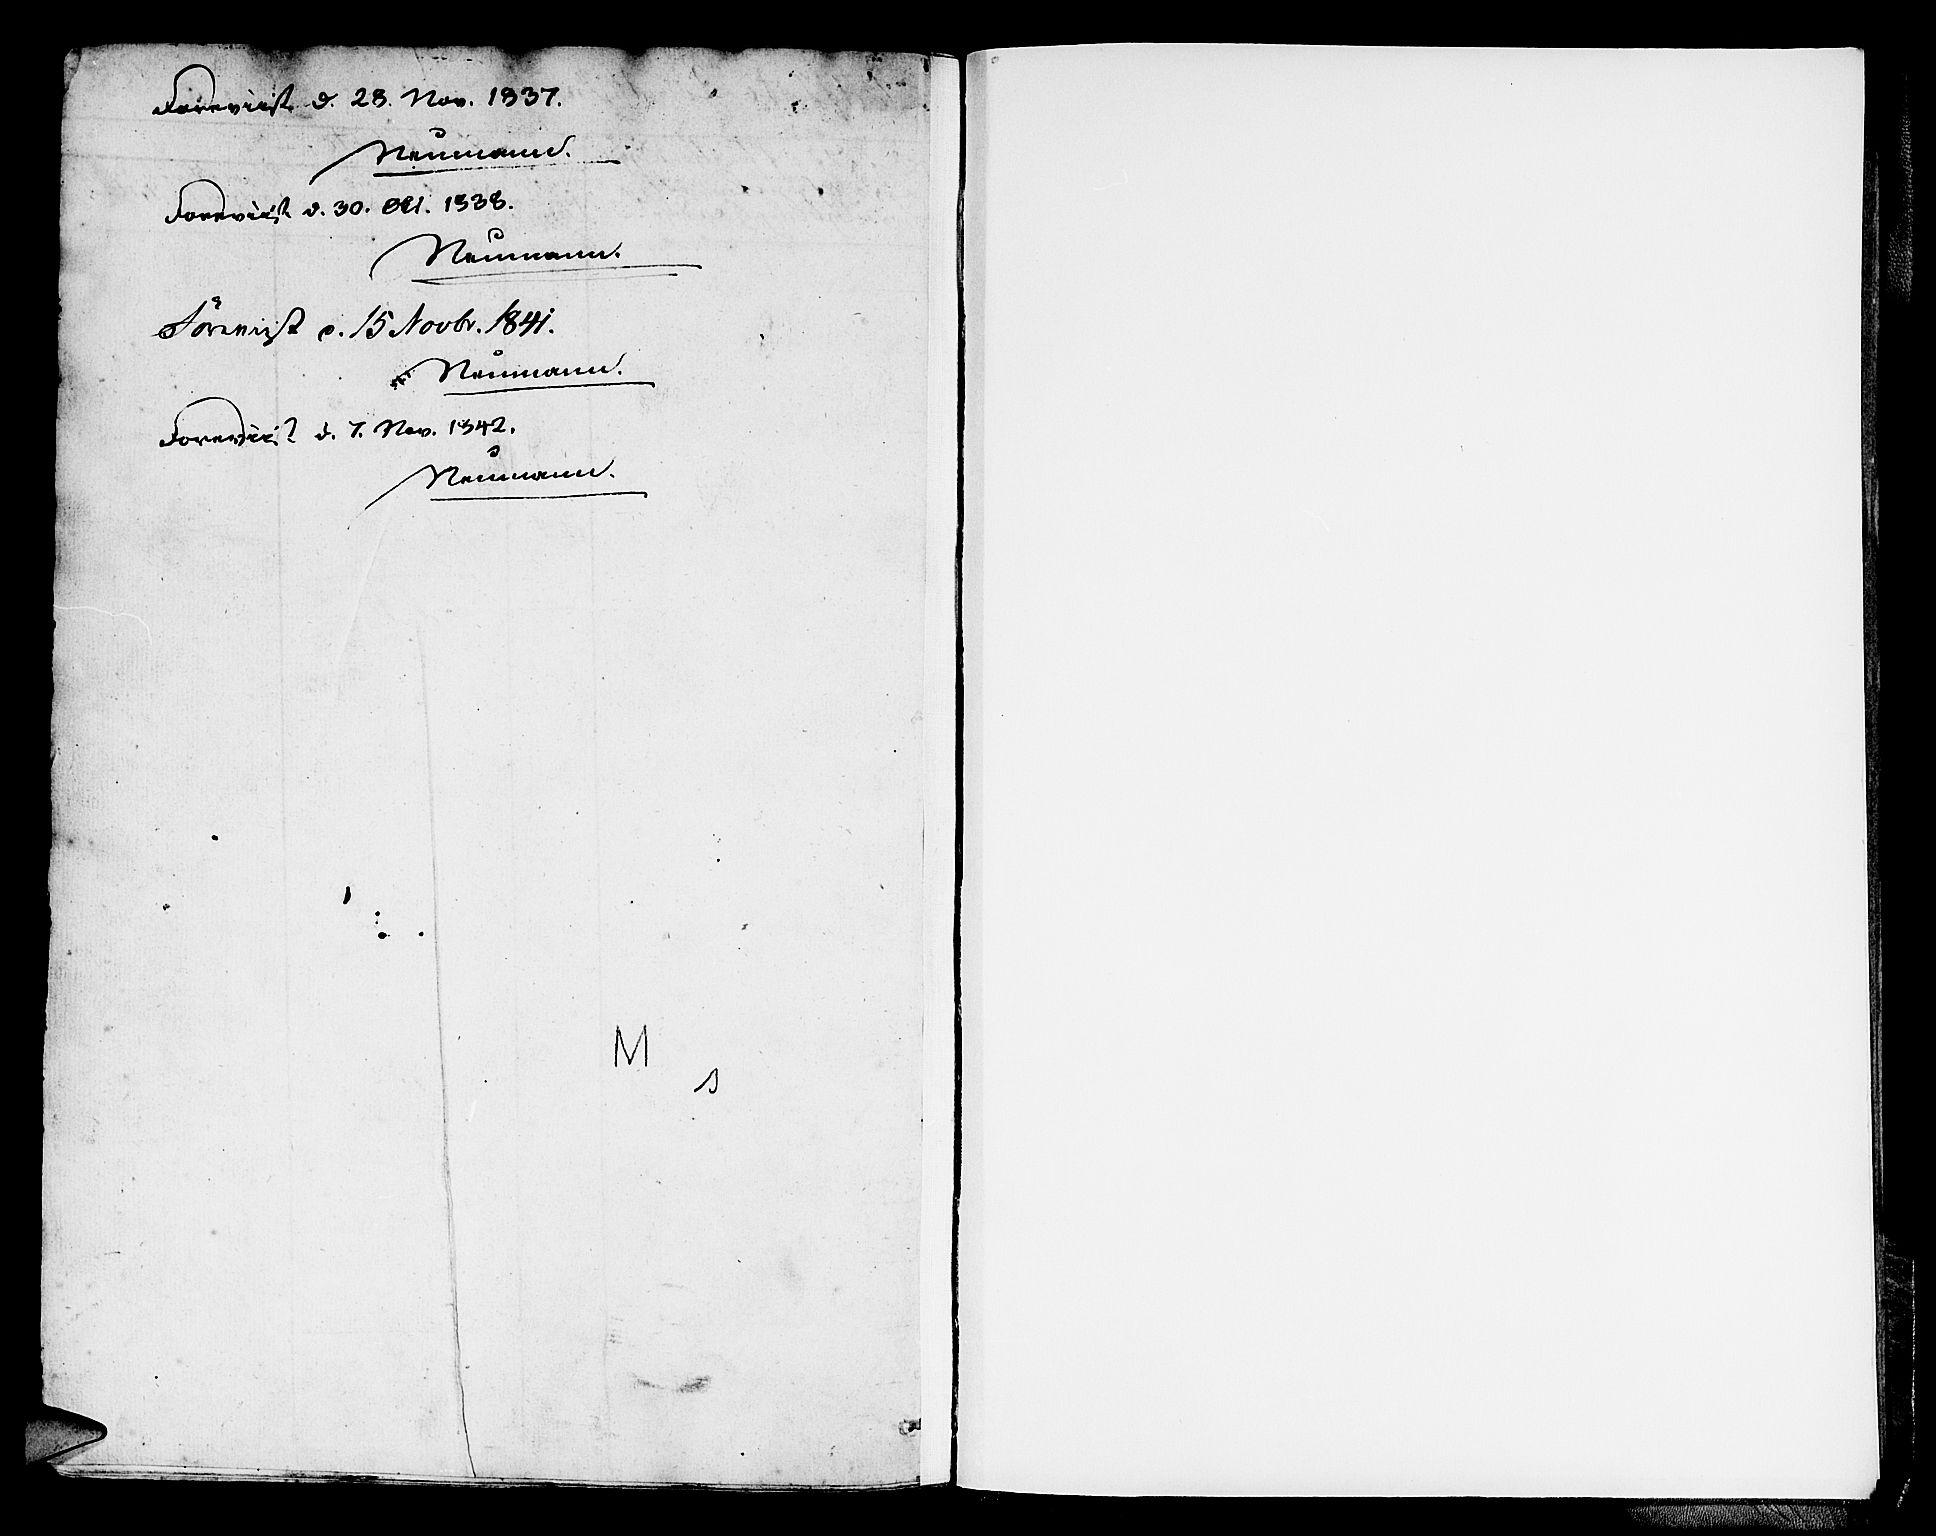 SAB, Domkirken Sokneprestembete, H/Hab/L0037: Klokkerbok nr. E 1, 1836-1848